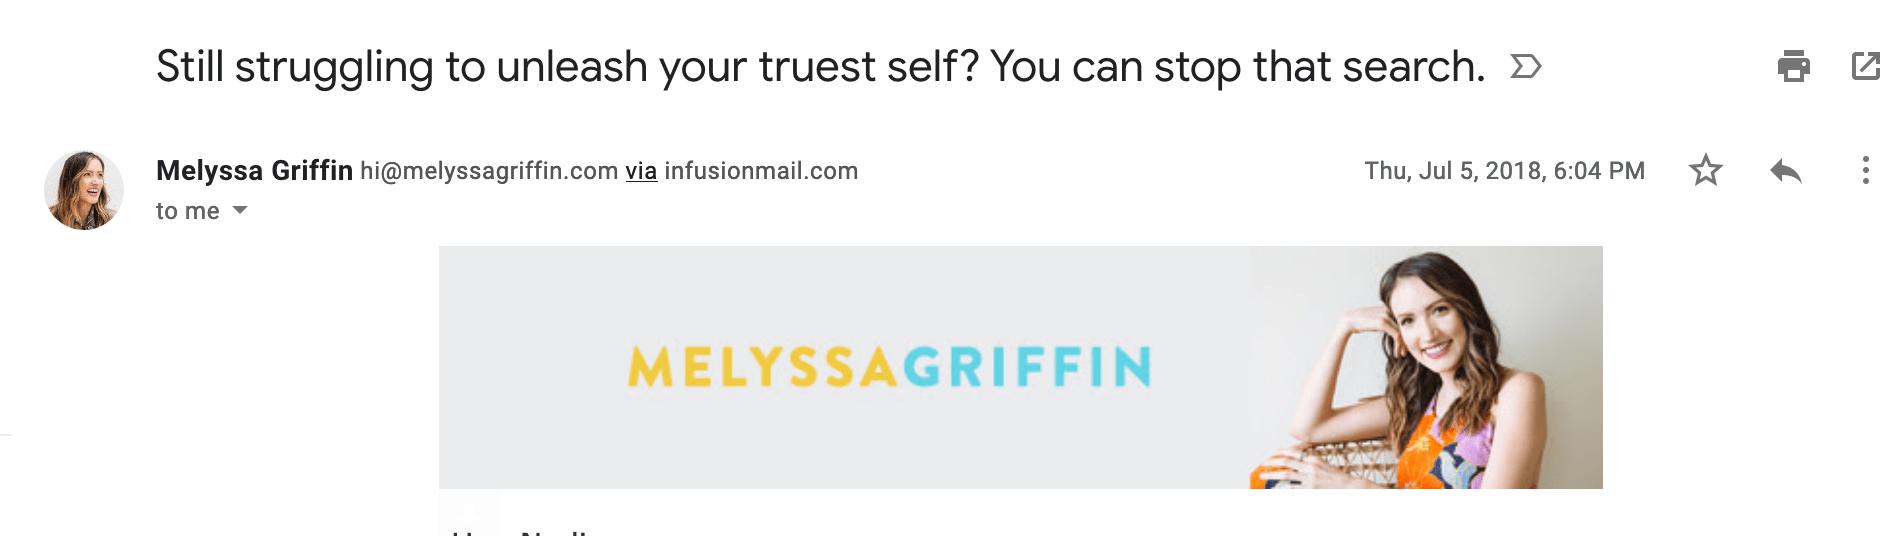 Melyssa Griffin effective headlines example